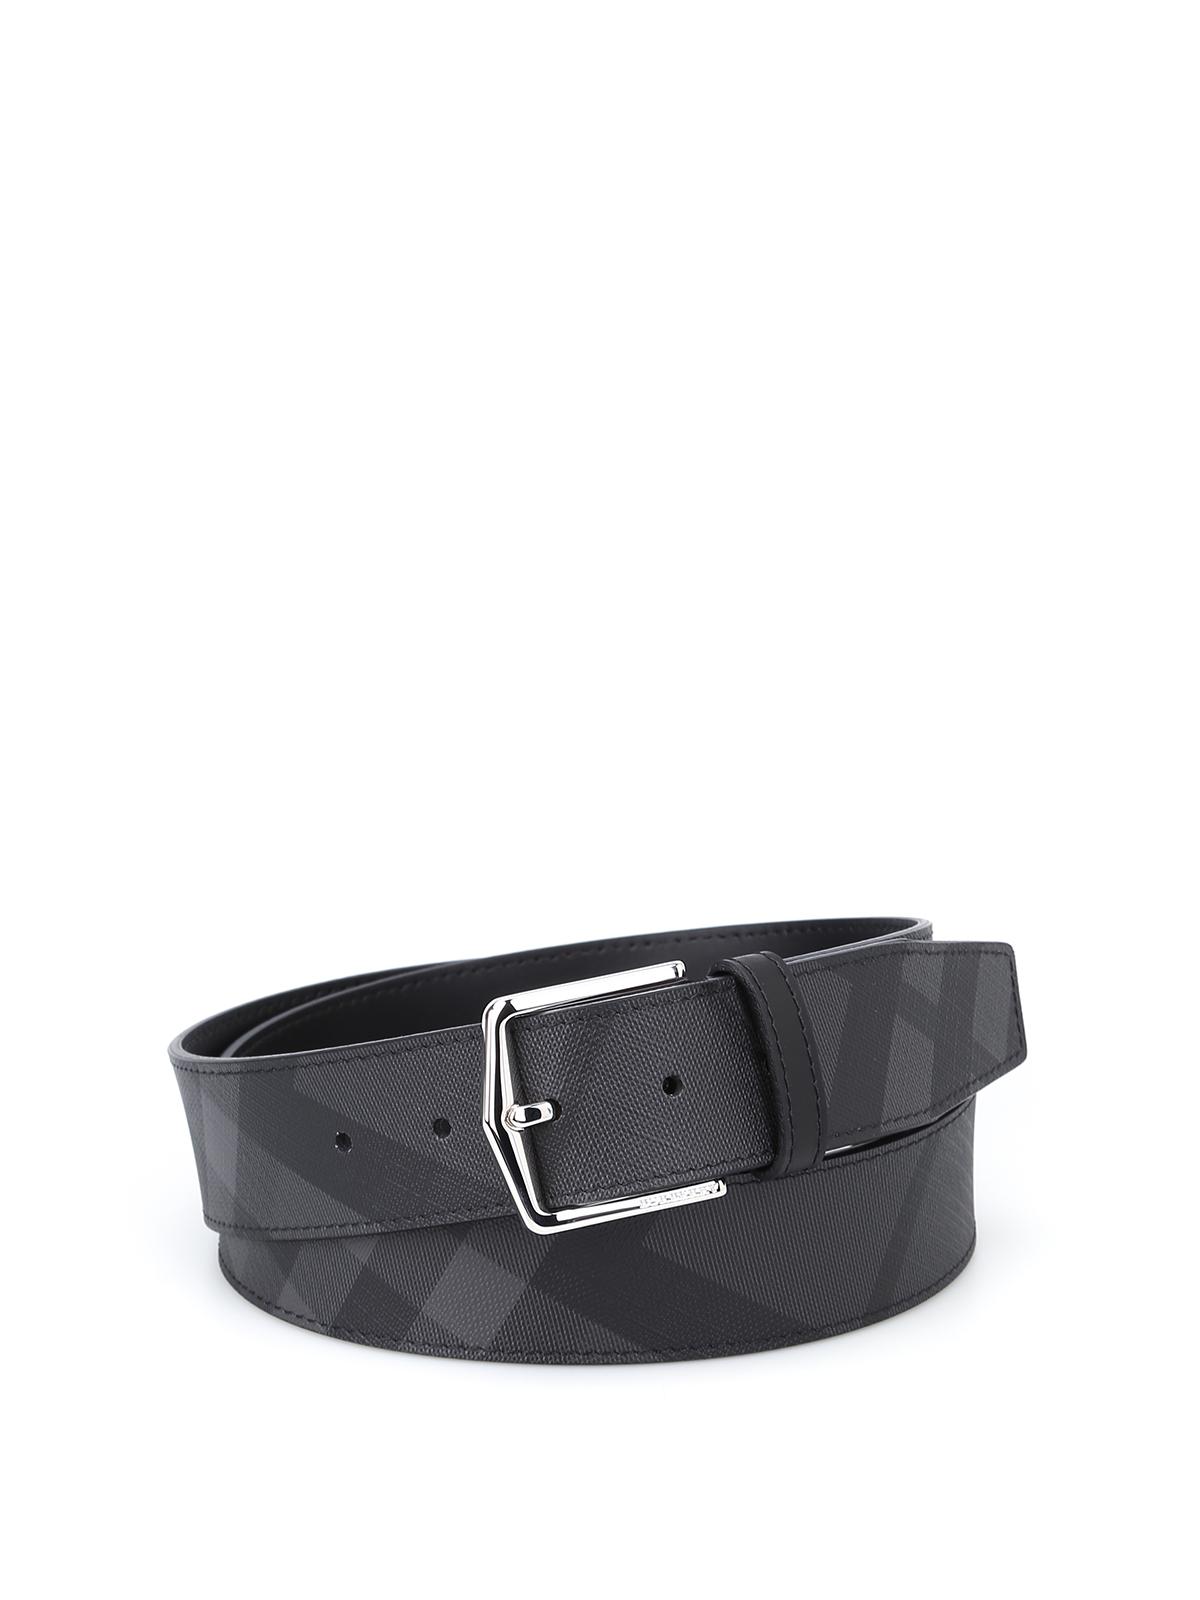 21595de66eb Burberry - Joe London Check belt - belts - 4056402